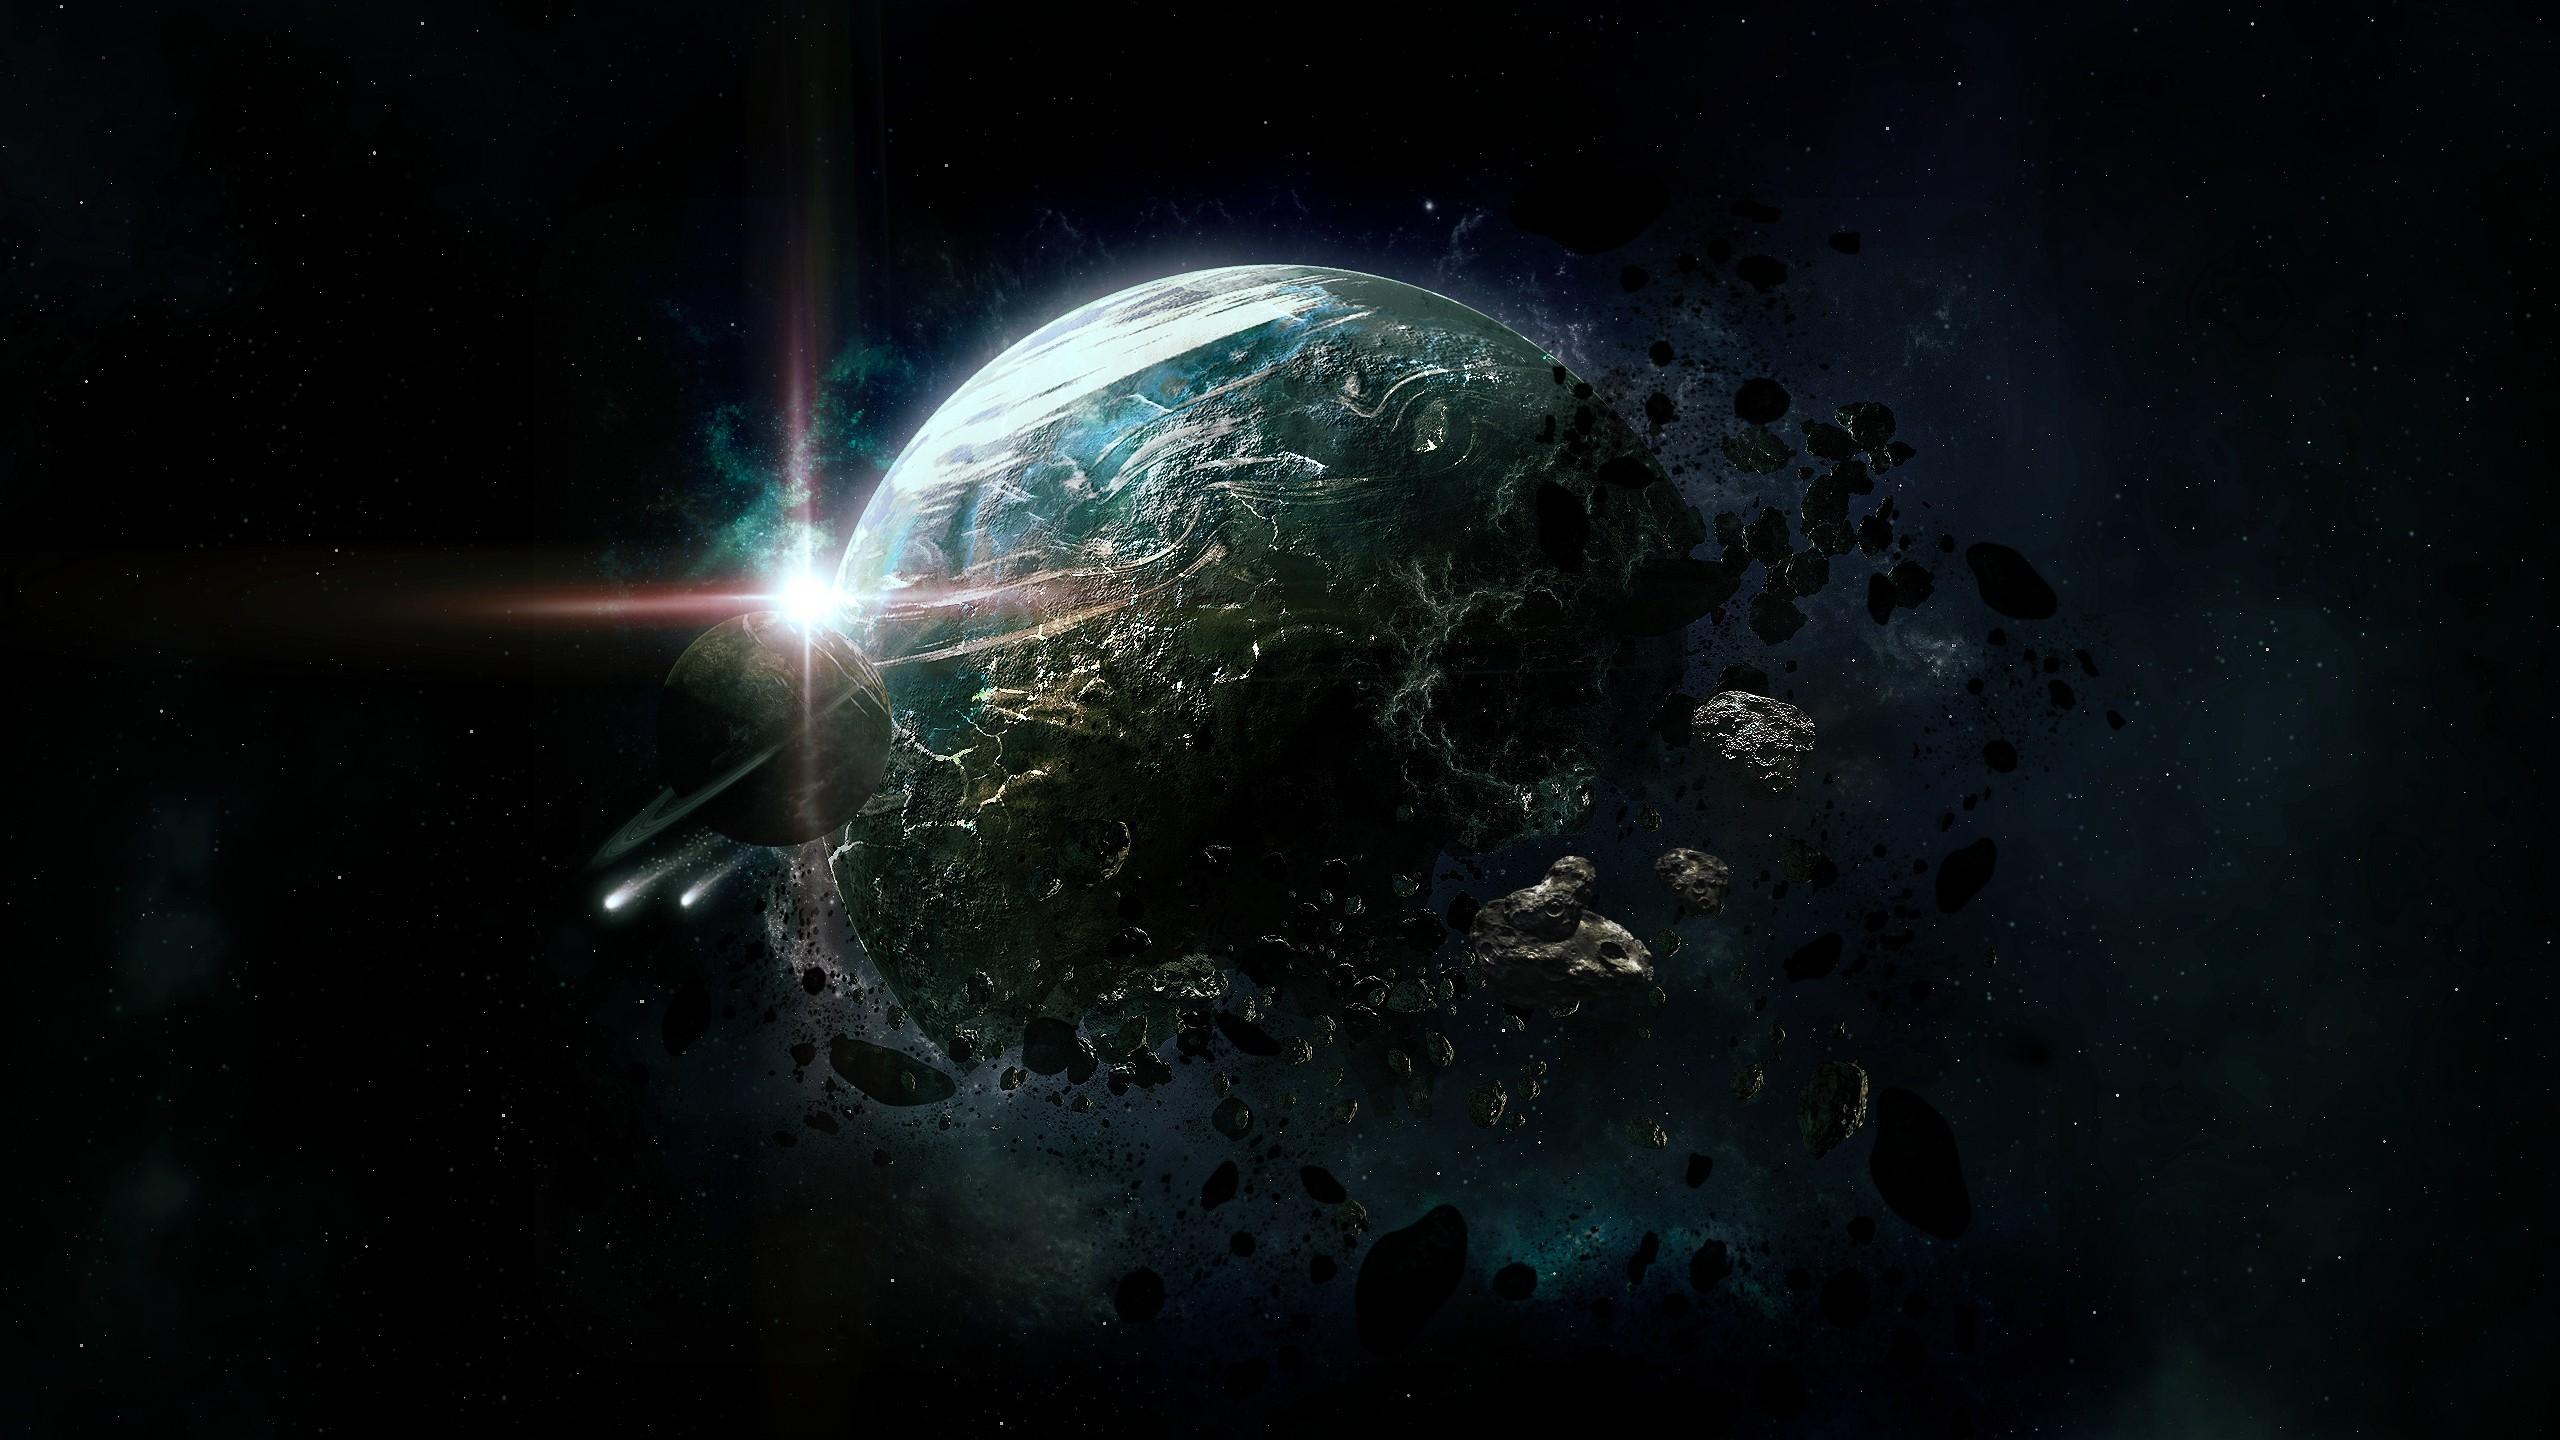 papel de parede planeta terra nebulosa atmosfera universo destrui o astronomia captura. Black Bedroom Furniture Sets. Home Design Ideas